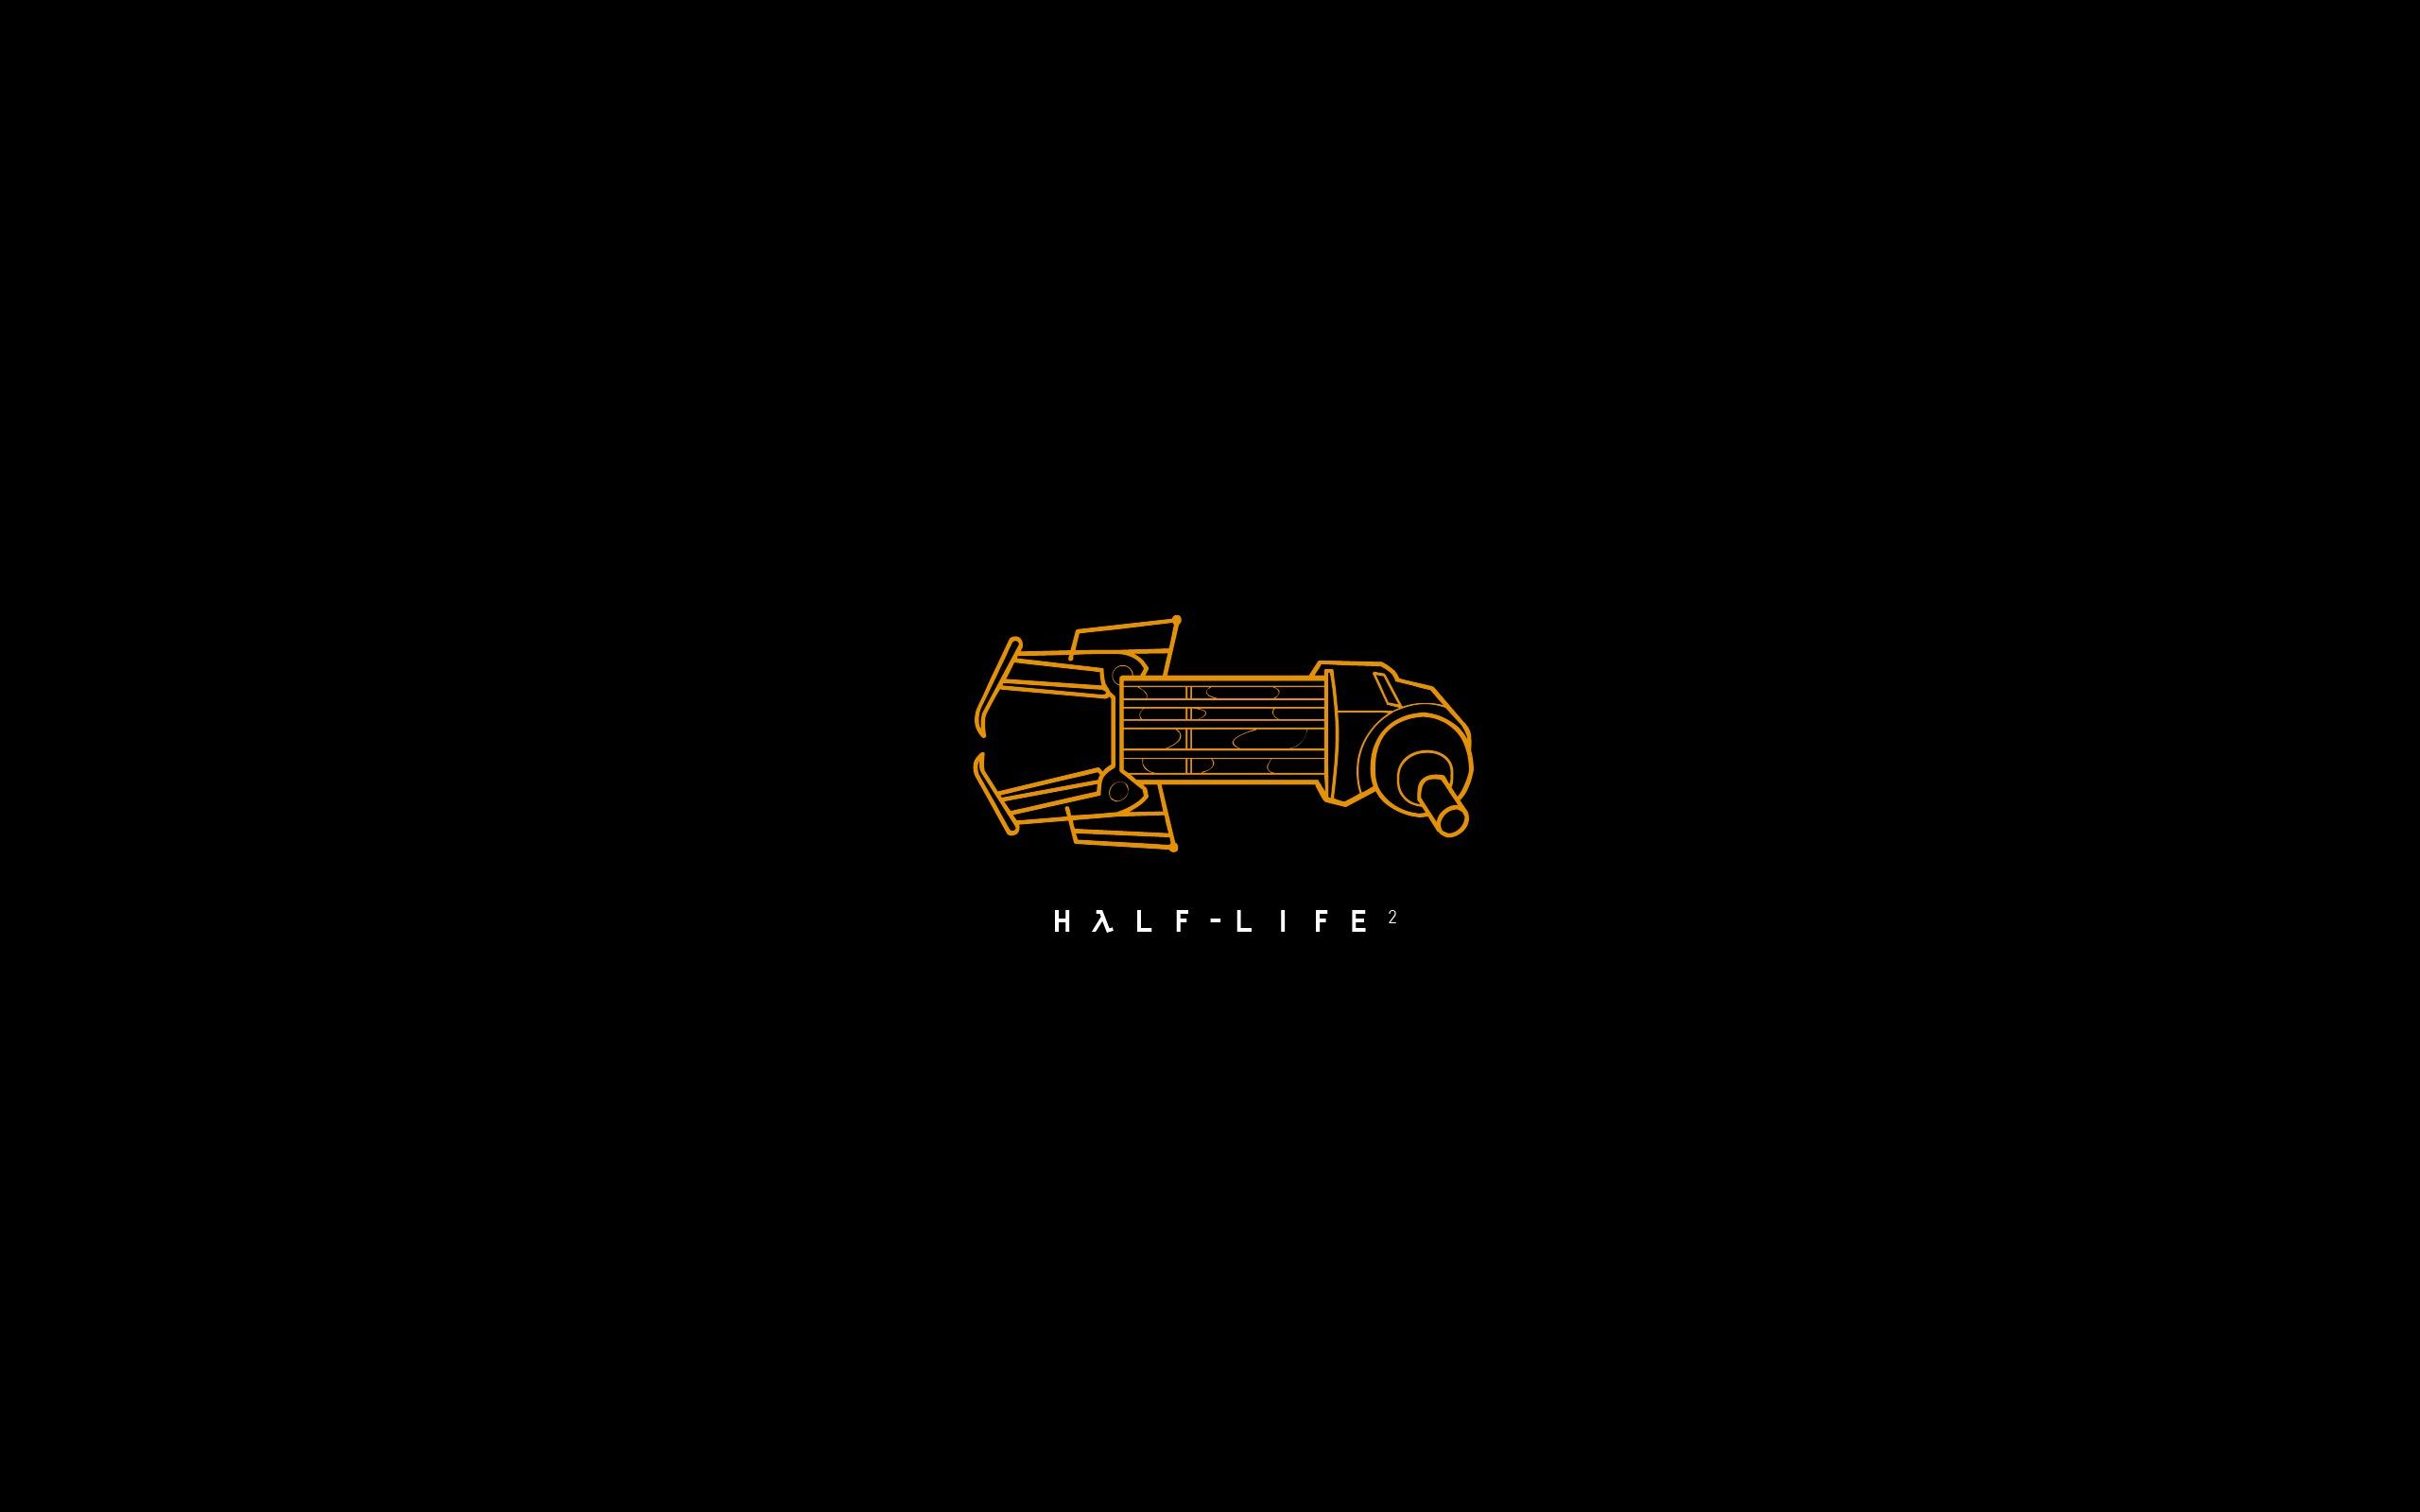 wallpaper : text, logo, brand, half life 2, gravity gun, art